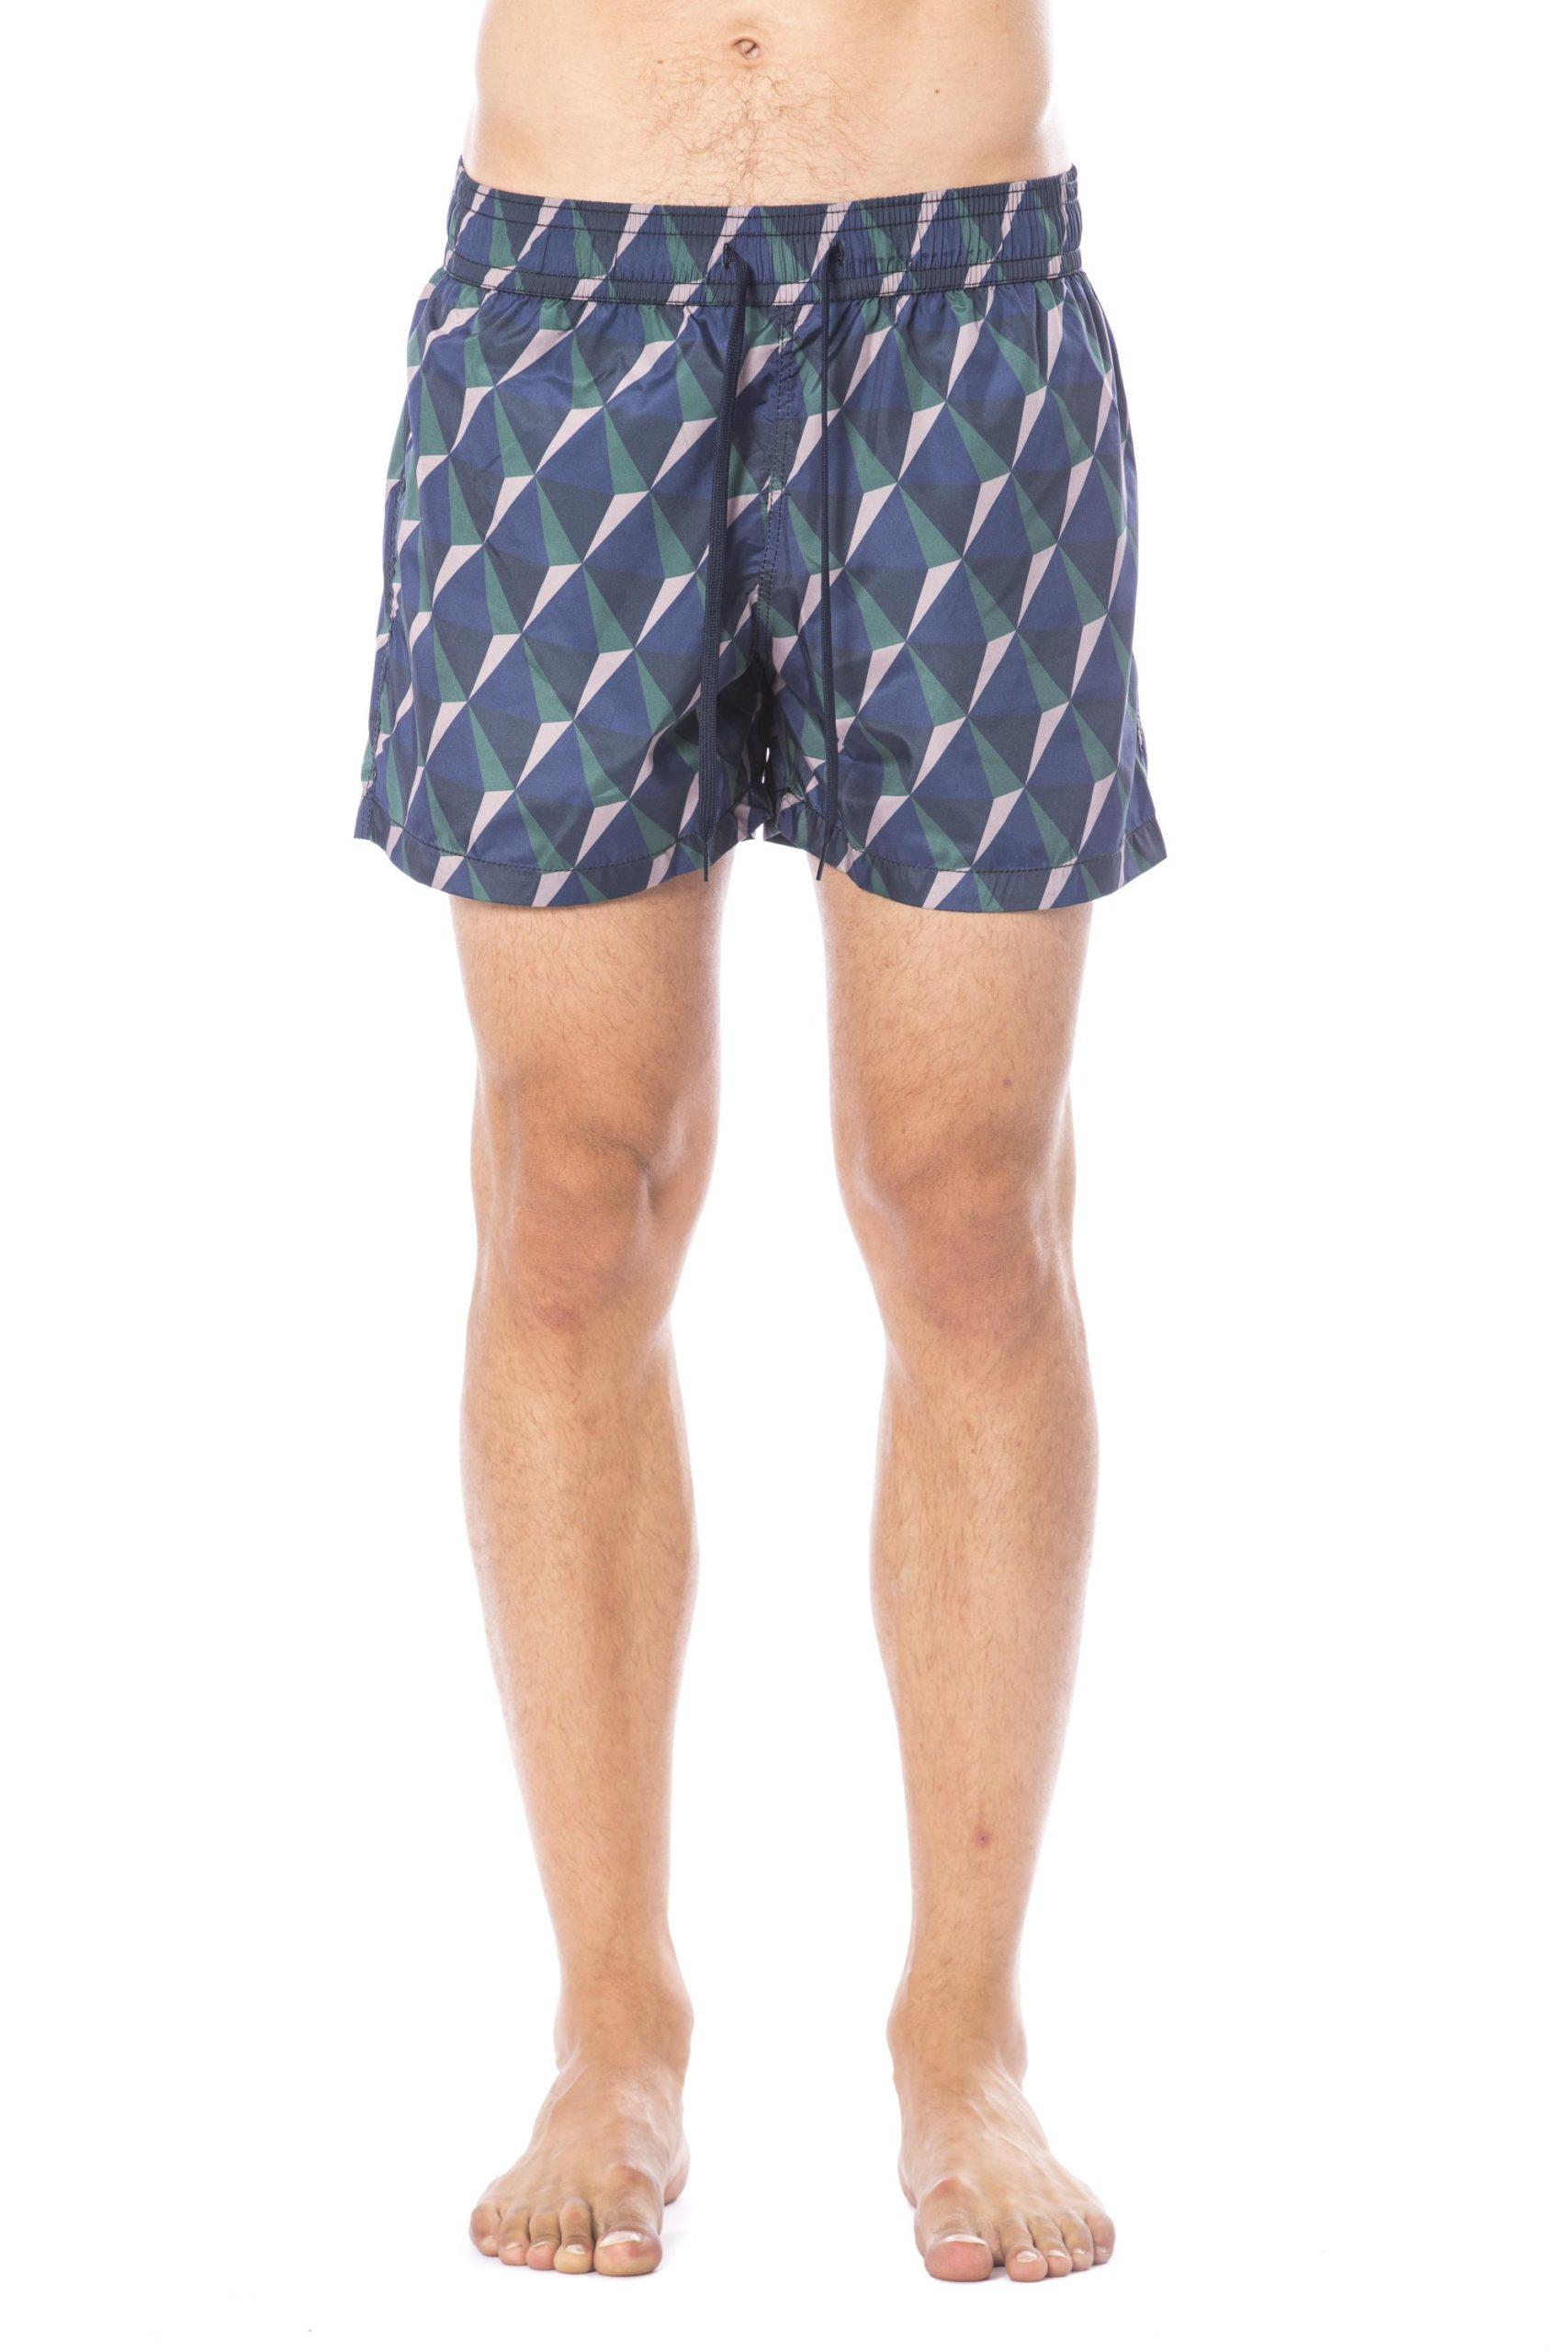 Verri Men's Verdemilitare Swimwear Multicolor VE677082 - M